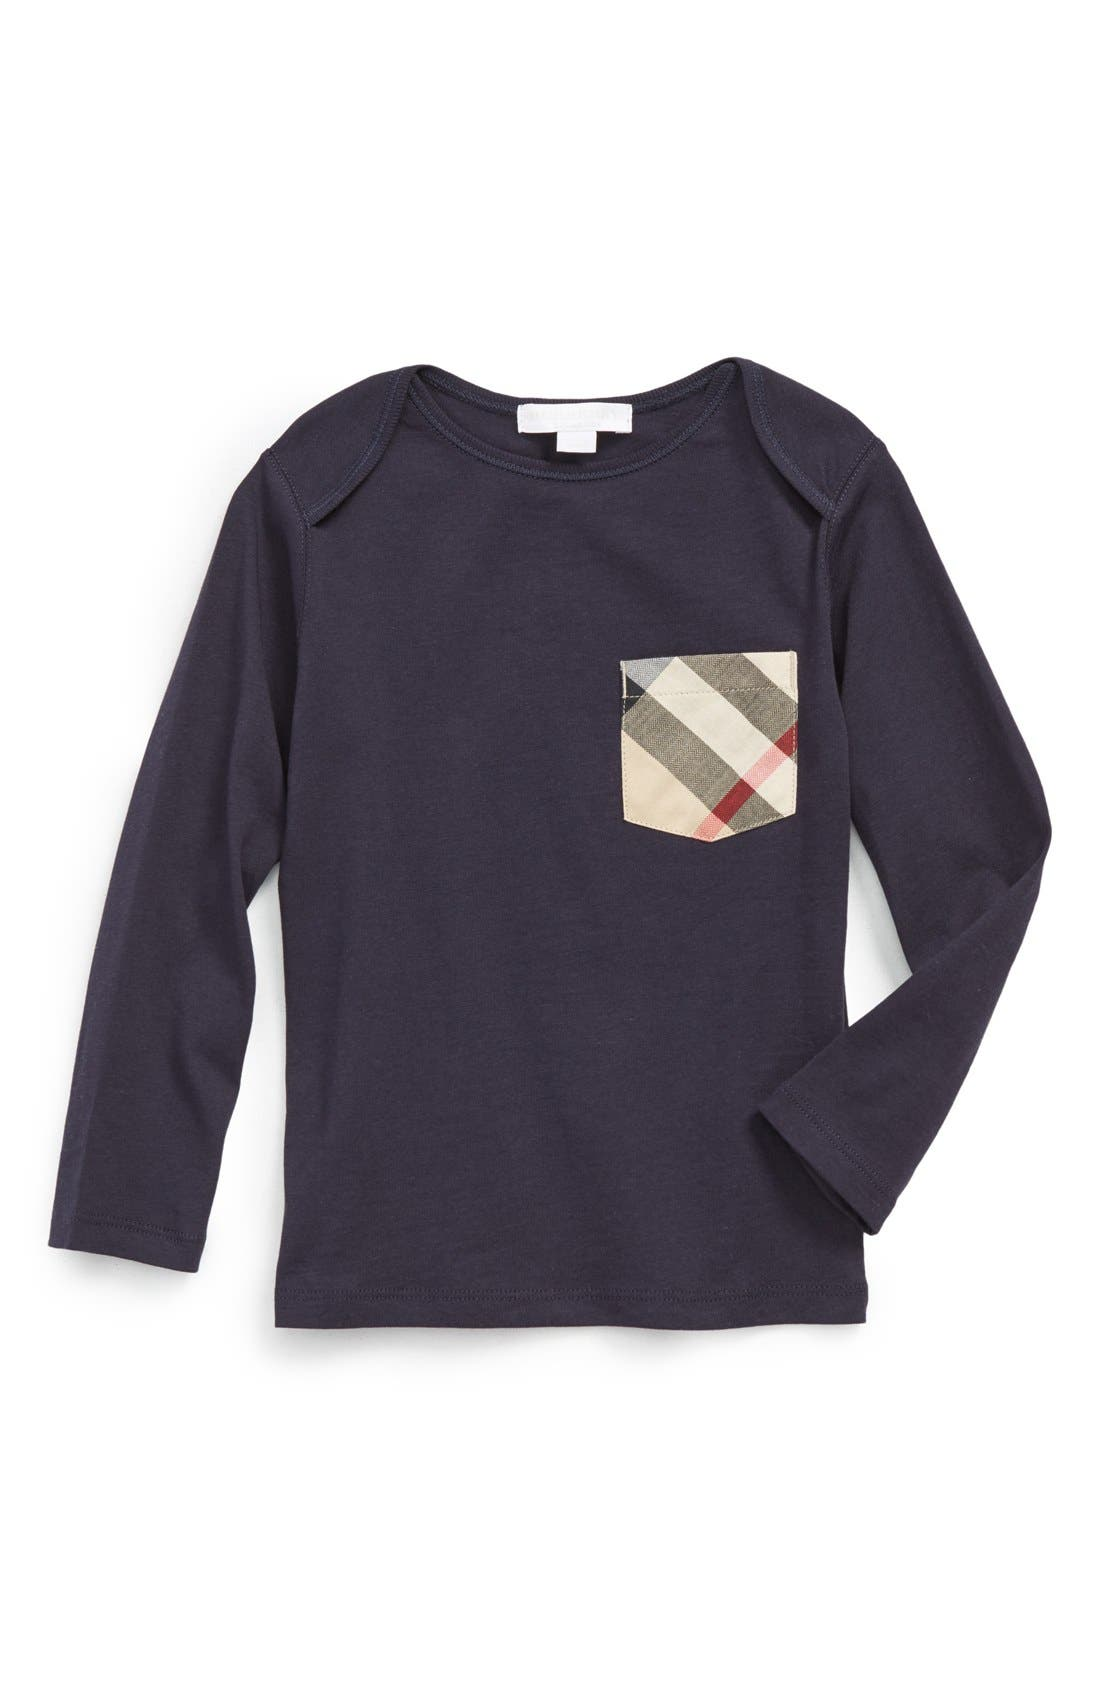 BURBERRY Callum Check Print Chest Pocket T-Shirt